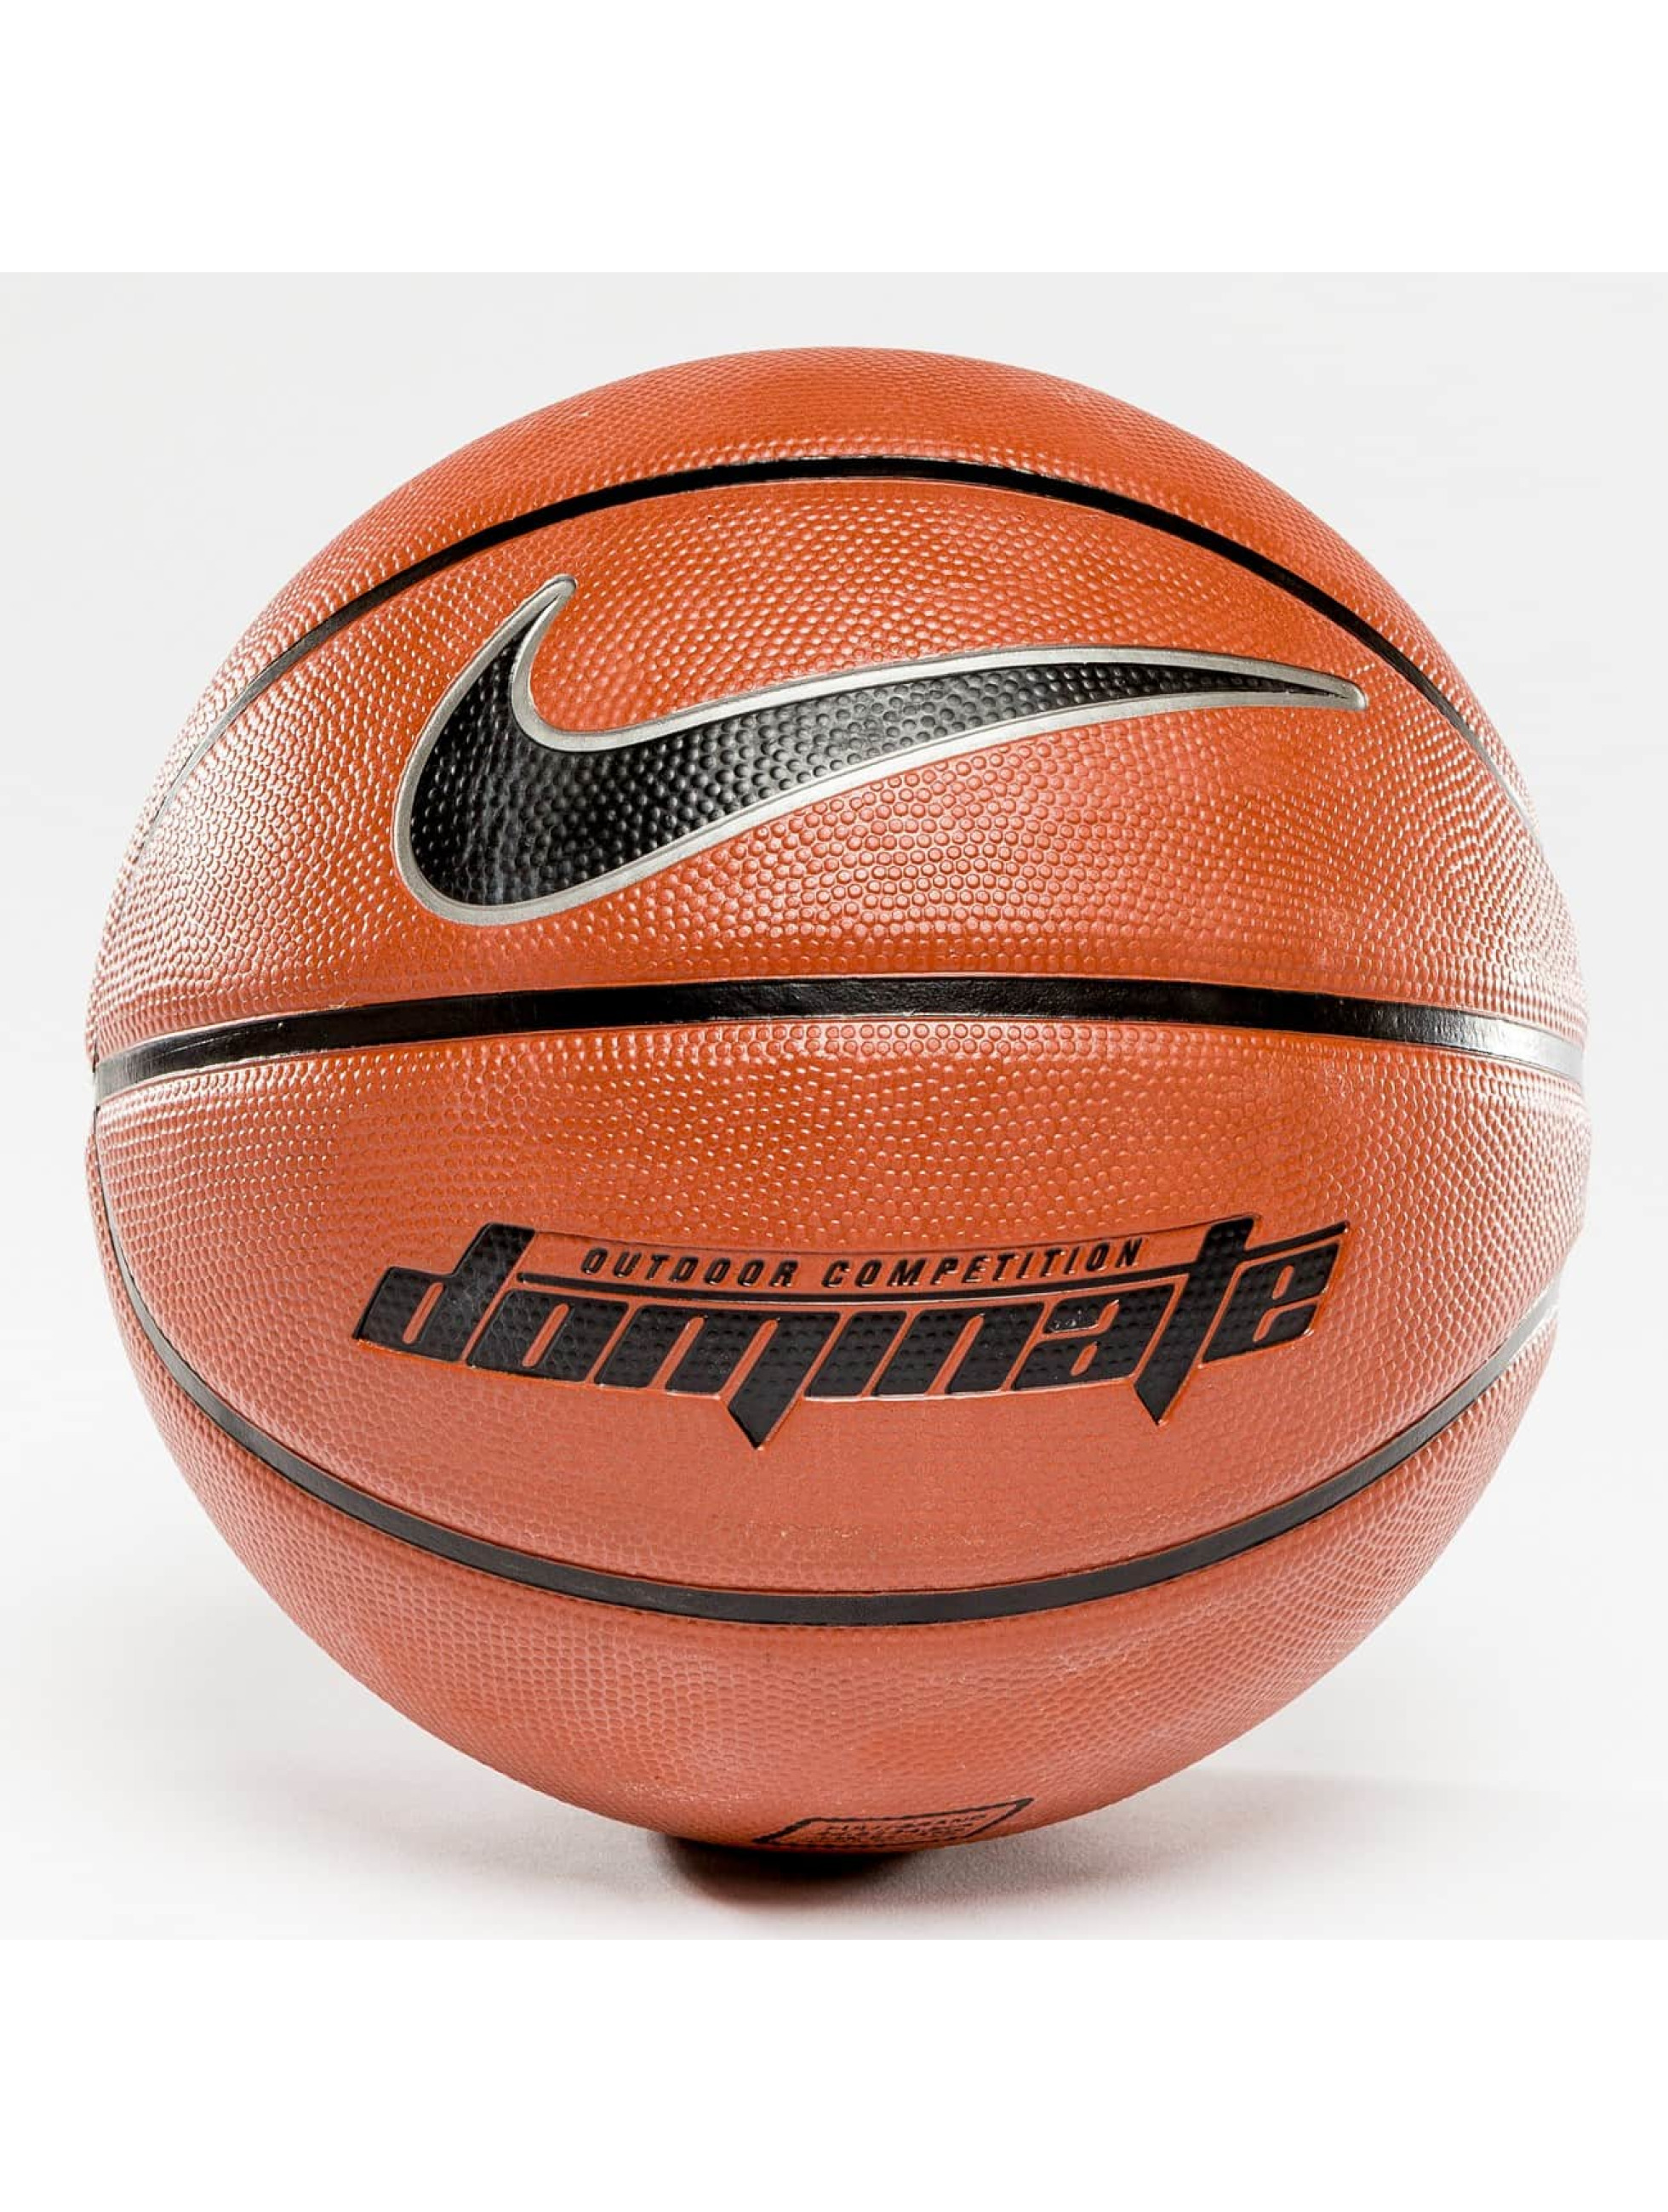 Nike Performance Männer,Frauen,Kinder Ball Dominate 8P in orange